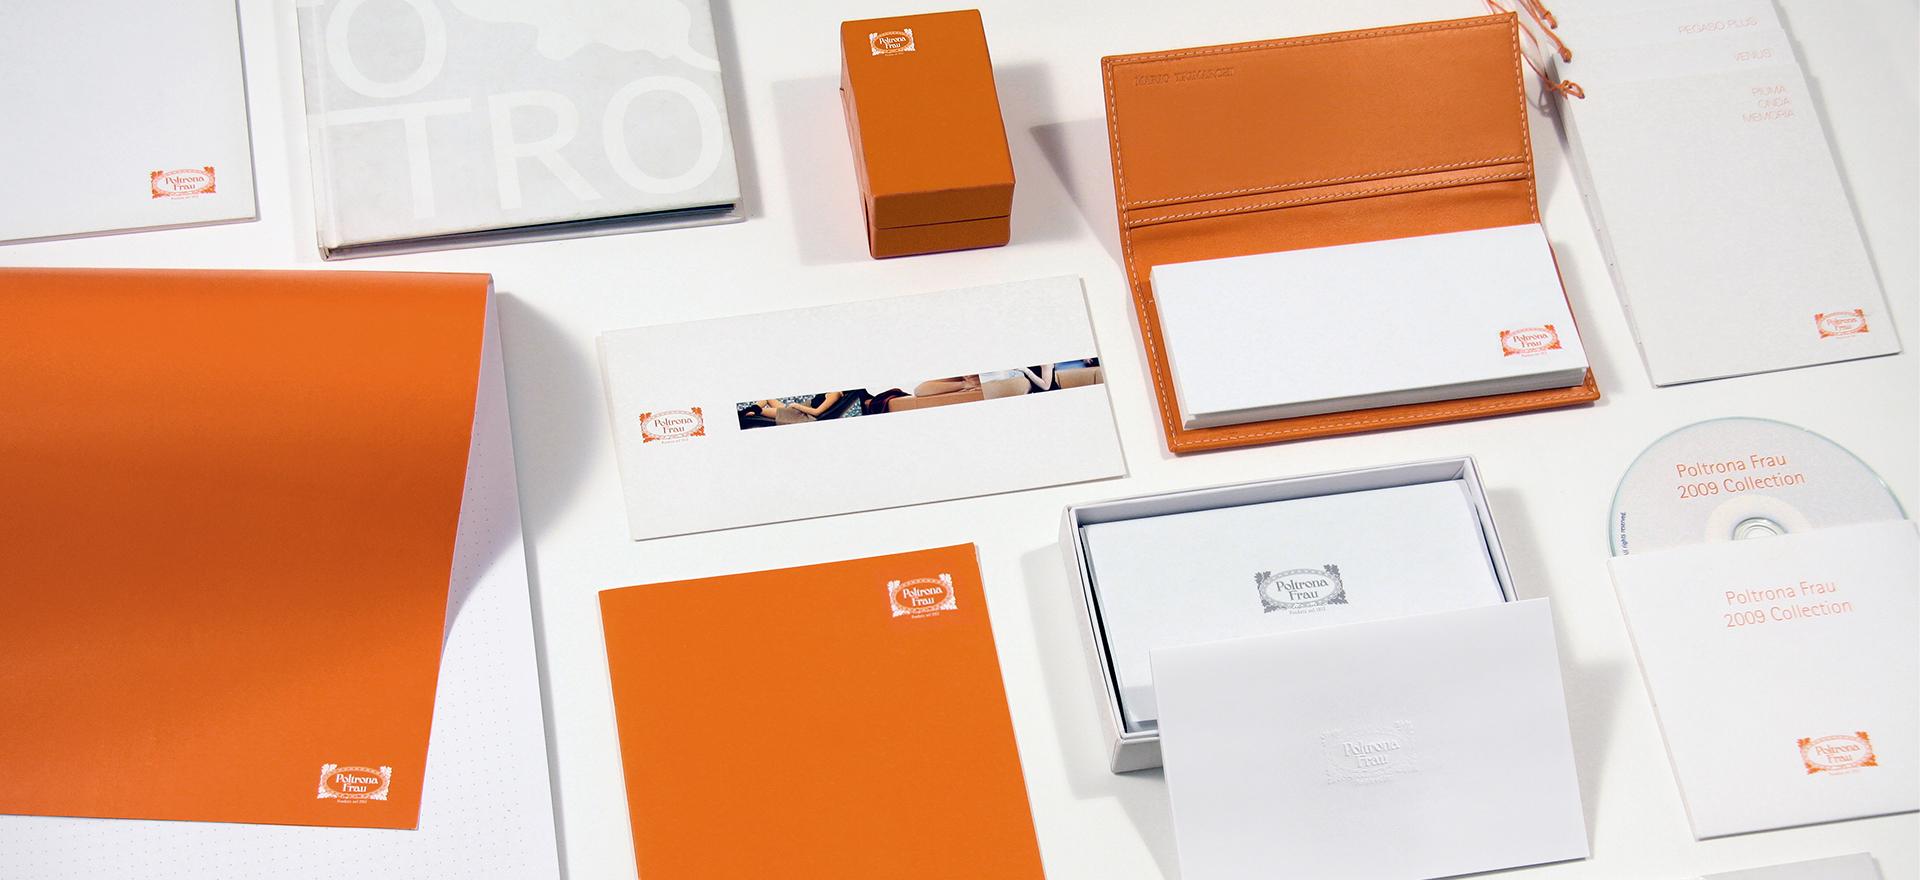 Art Direction | Graphic Design | Branding | Poltrona Frau | Mario Trimarchi Design | Fragile